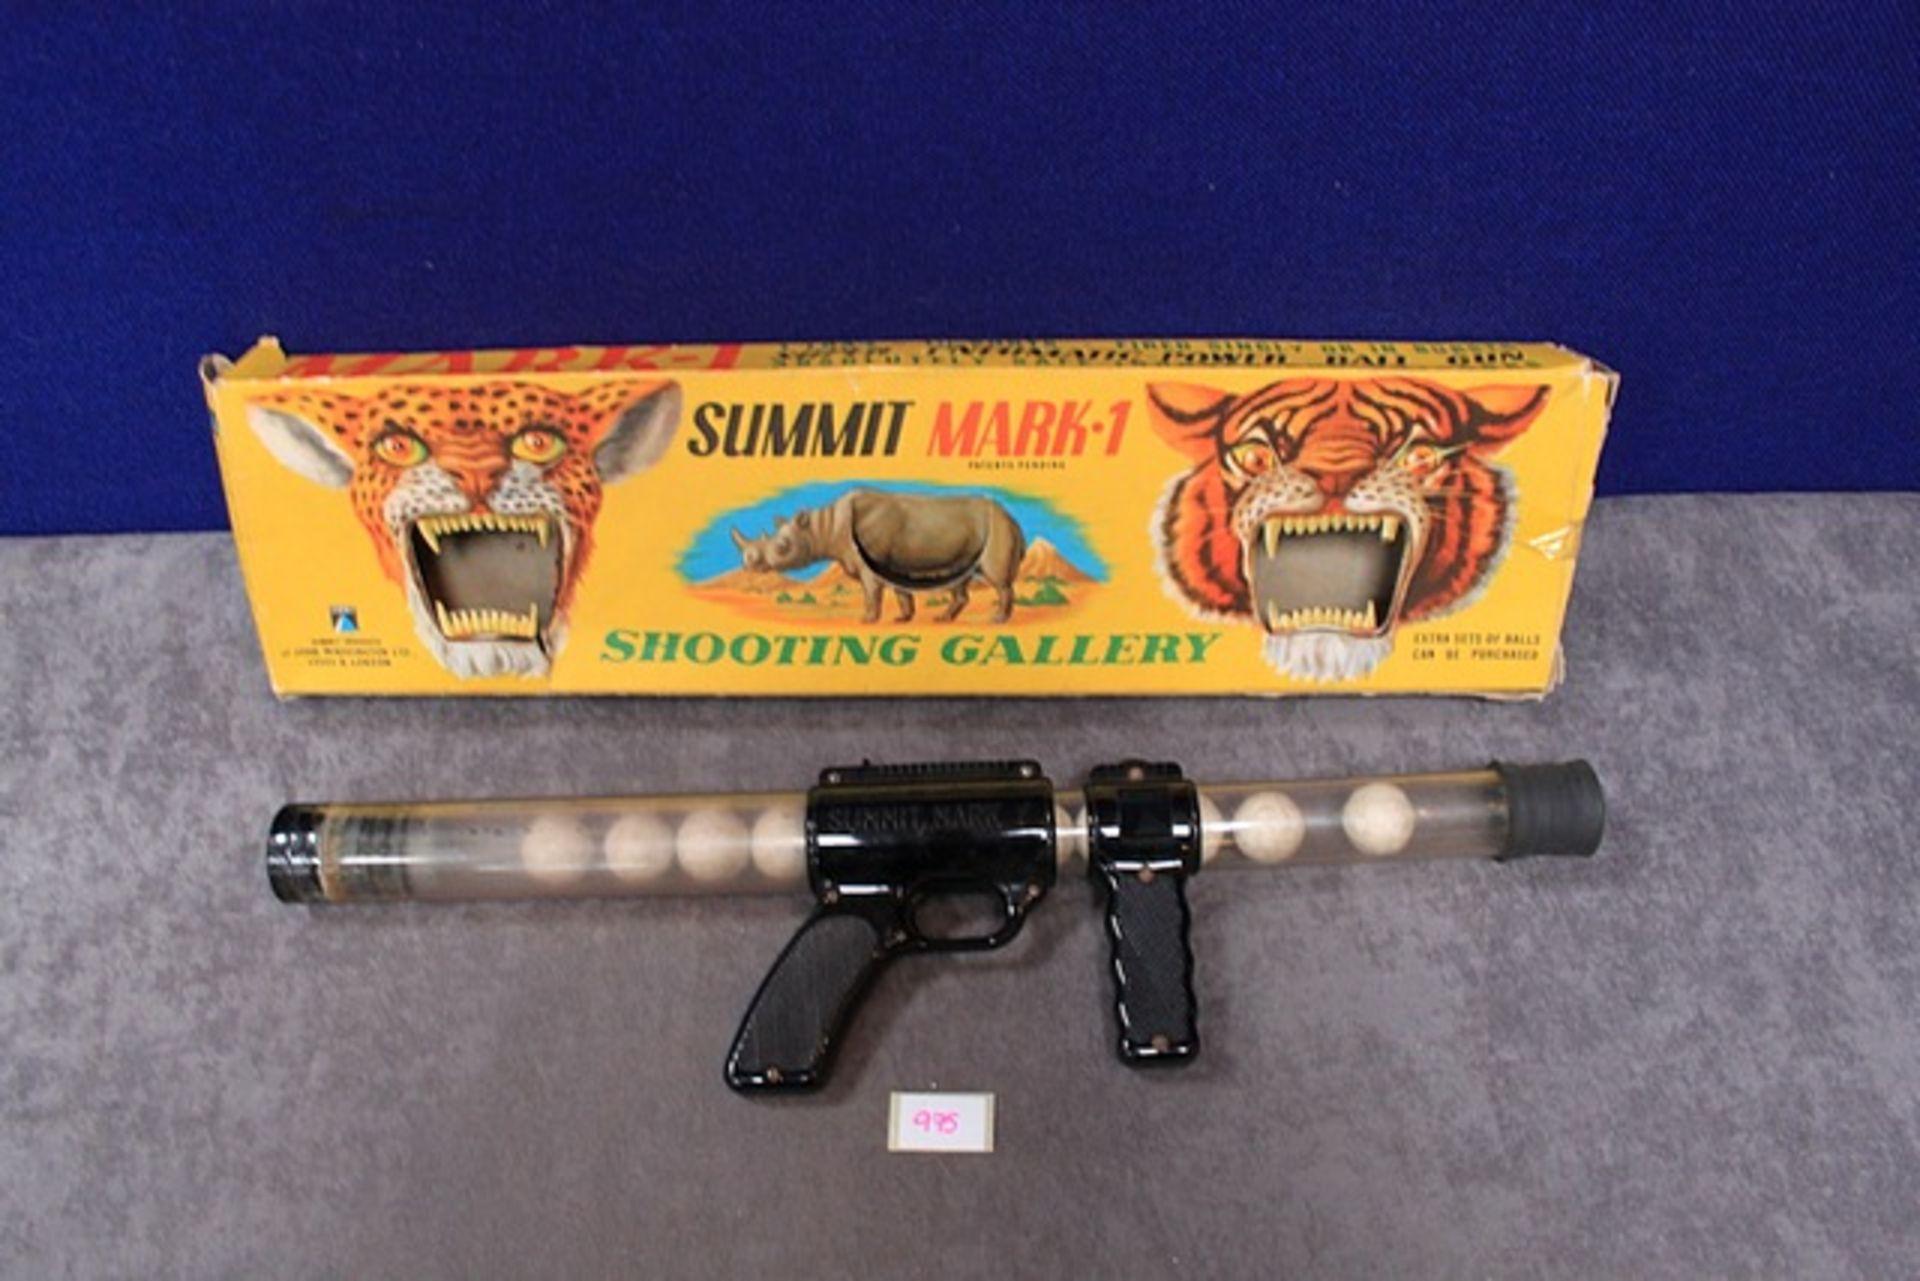 Lot 975 - Summit Products Of John Waddington Ltd Summit Mark 1 Shooting Gallery In Box